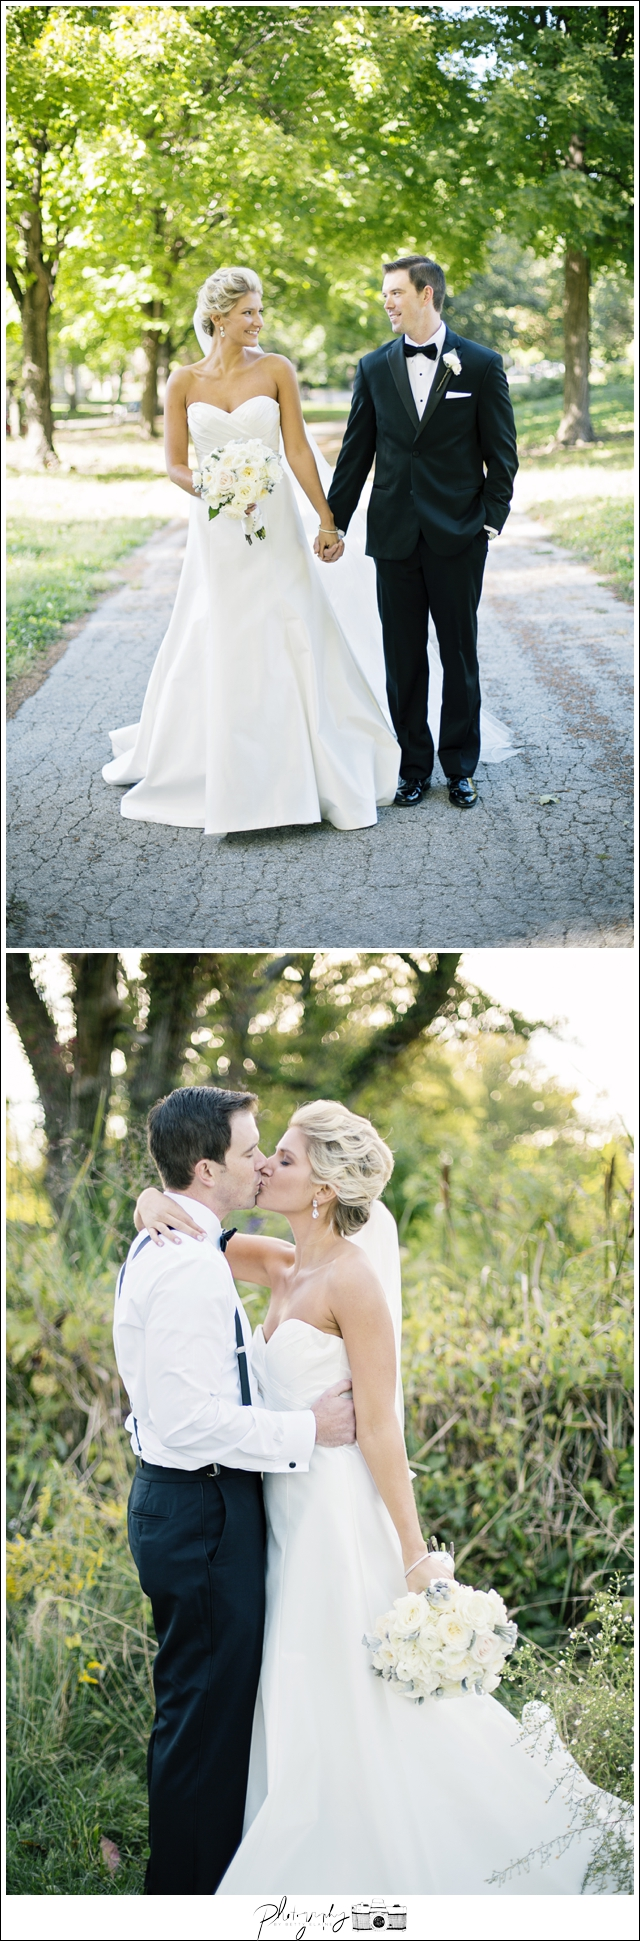 Wedding-Photographer-Bride-Groom-Kissing-Portrait-Seattle-Wedding-Photography-by-Betty-Elaine_0001